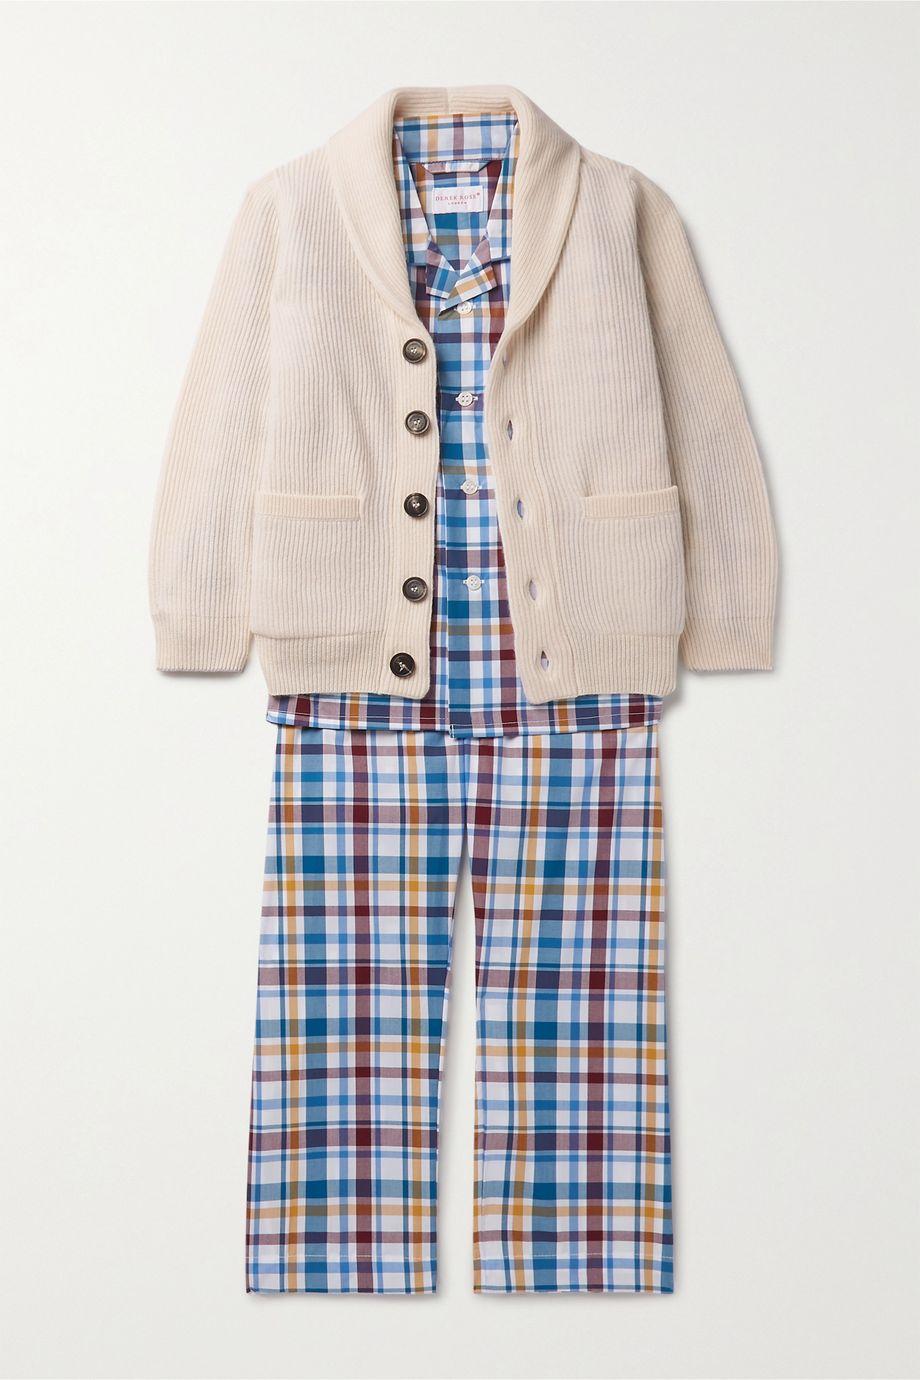 Derek Rose Kids 【3 - 12 岁】格纹纯棉睡衣套装